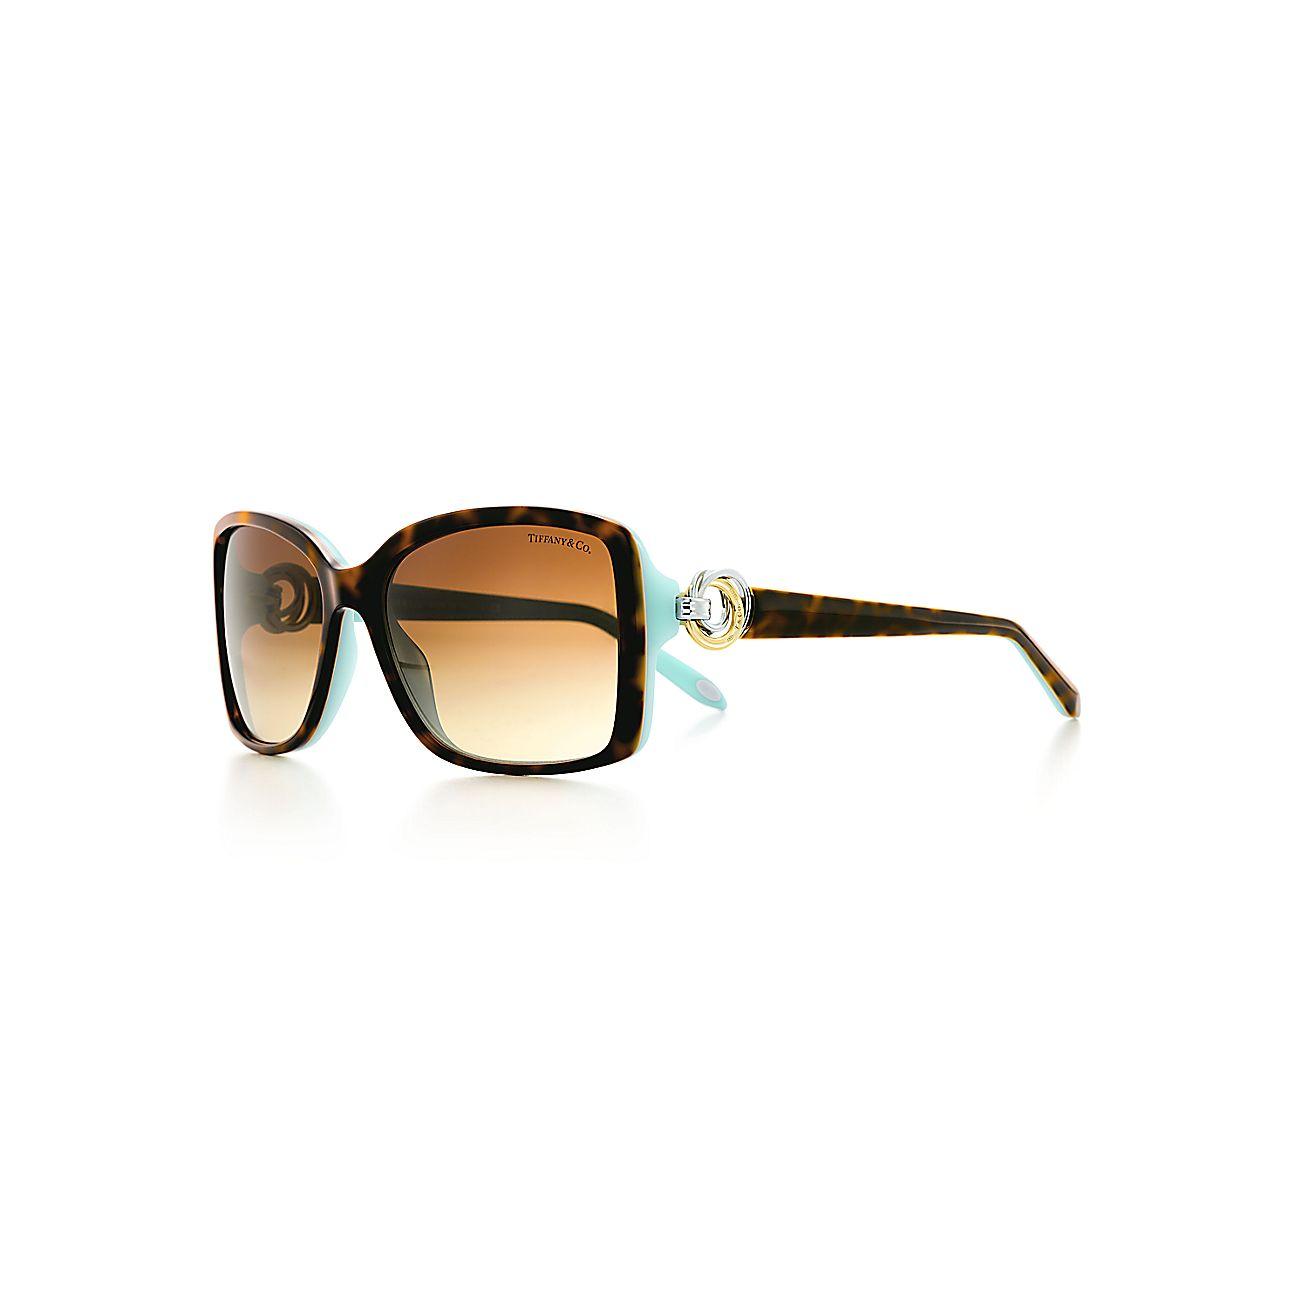 Tiffany 1837™:Rectangular Sunglasses